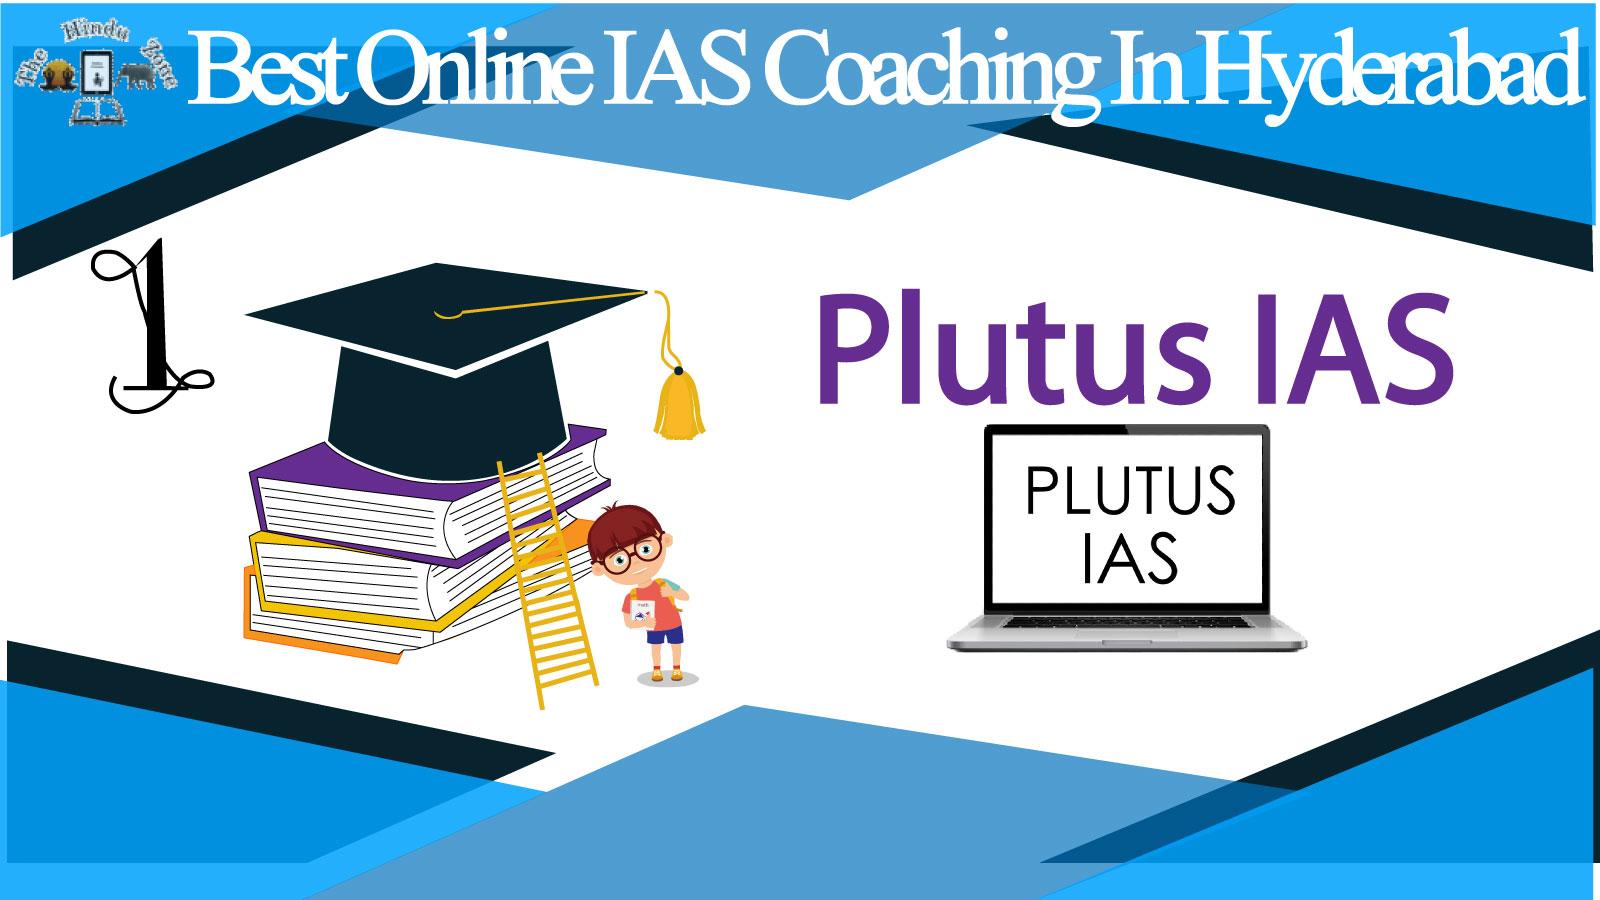 Plutus IAS Online Coaching in Hyderabad